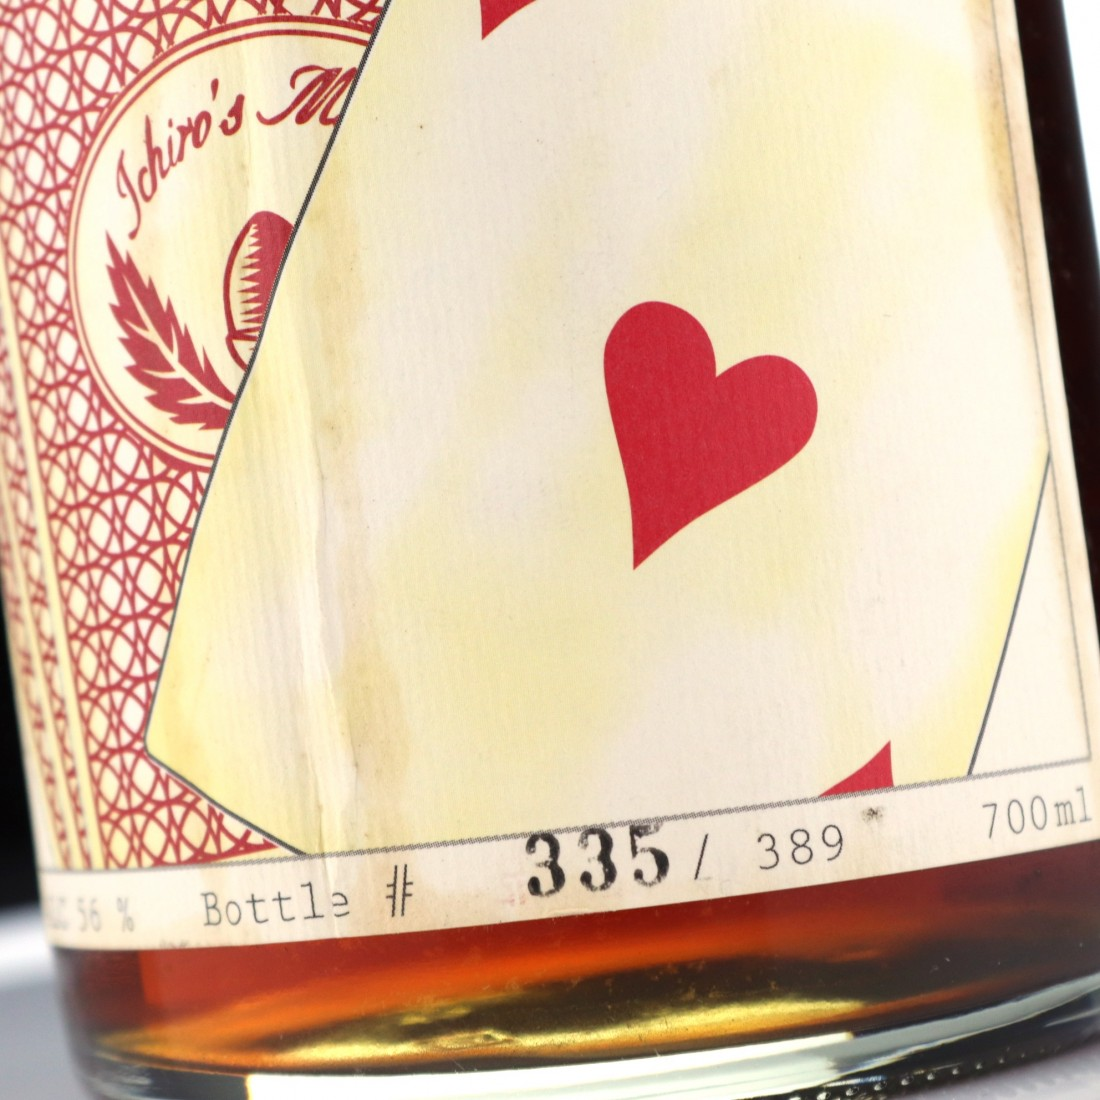 Hanyu 1985 Ichiro's Malt 'Card' #9004 / Ace of Hearts